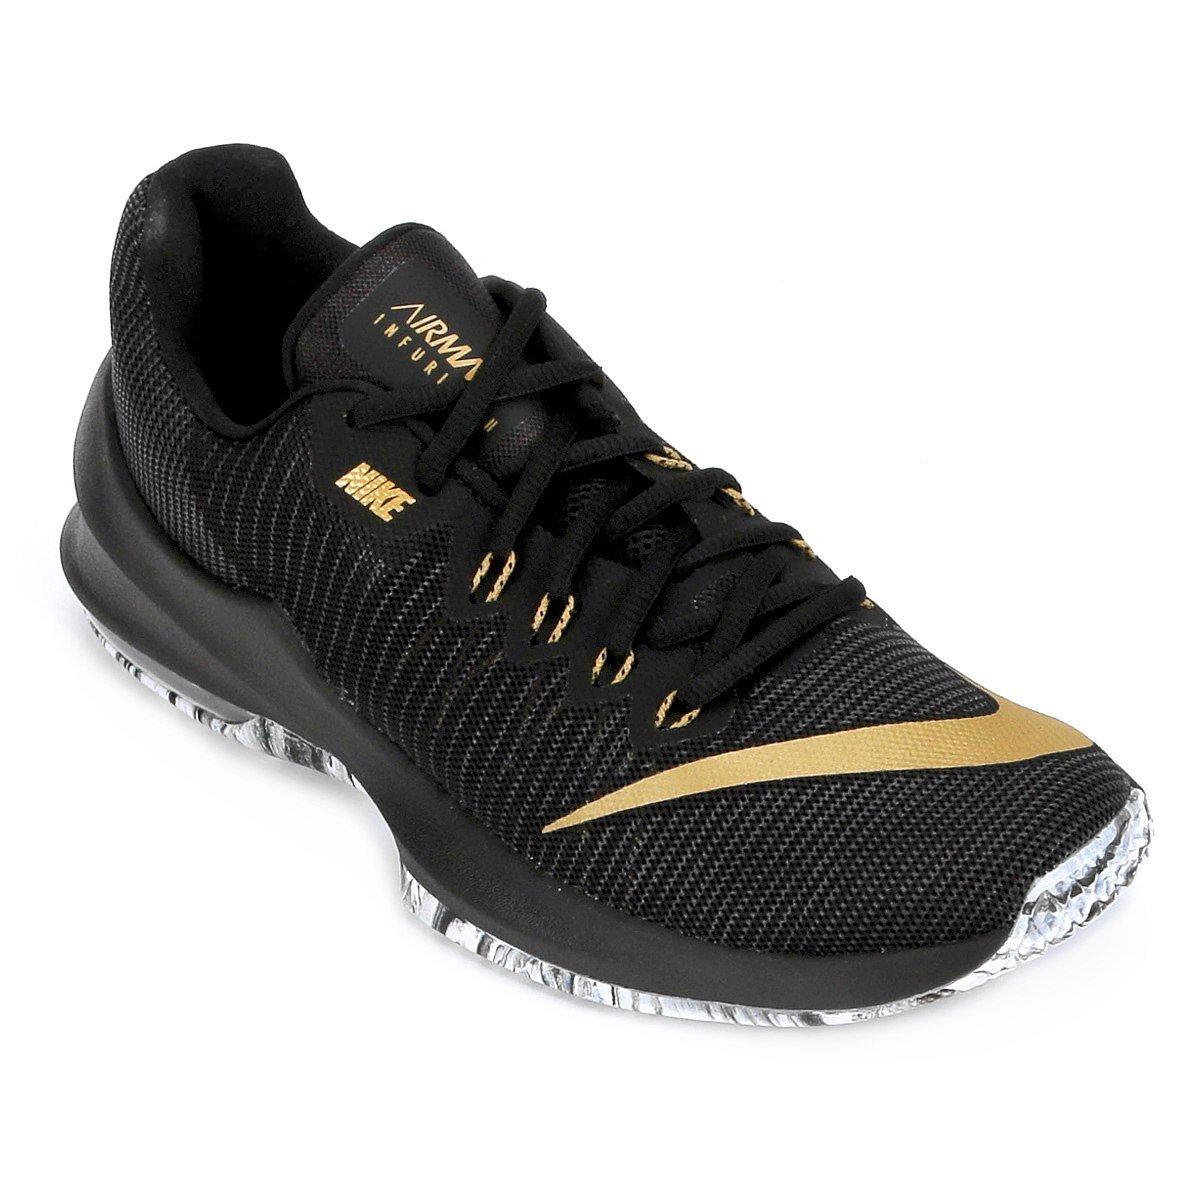 aab4e83a0 Tênis Masculino Nike Air Max Infuriate 2 Low Low 2 908975 090 Preto 320e16